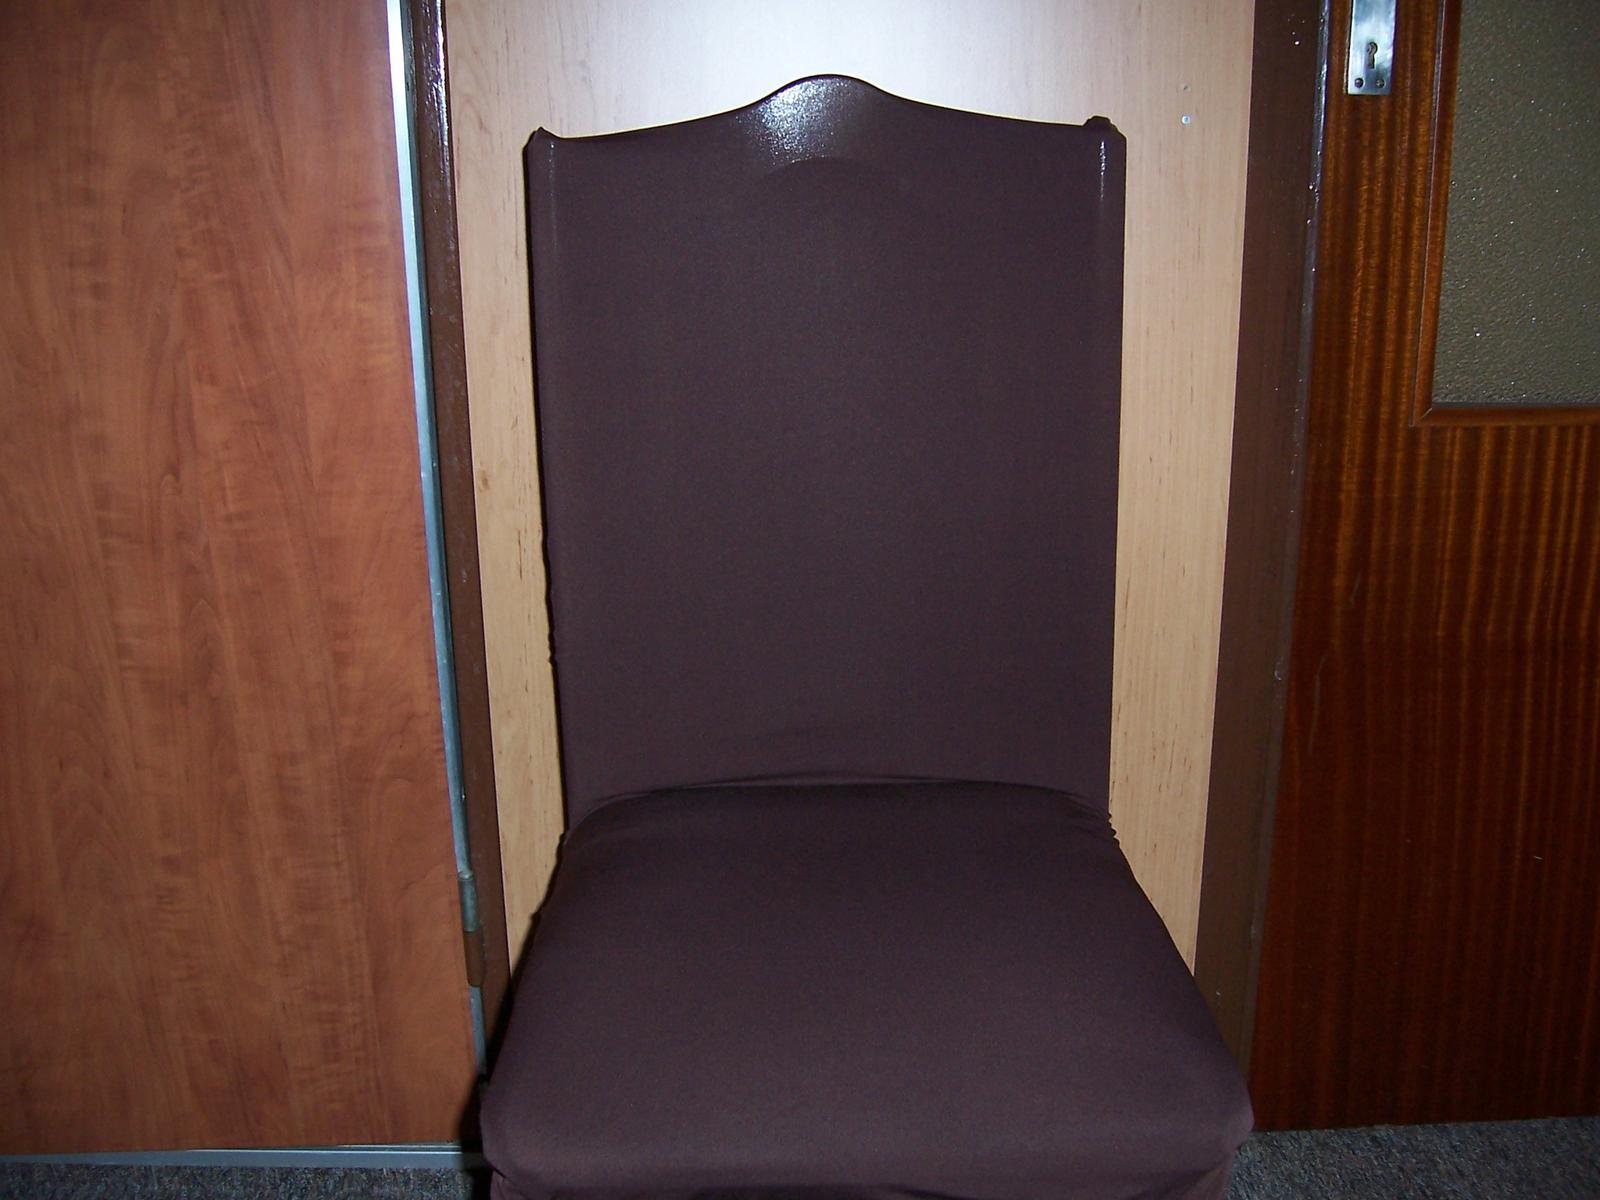 poťahy na stoličky - Obrázok č. 1